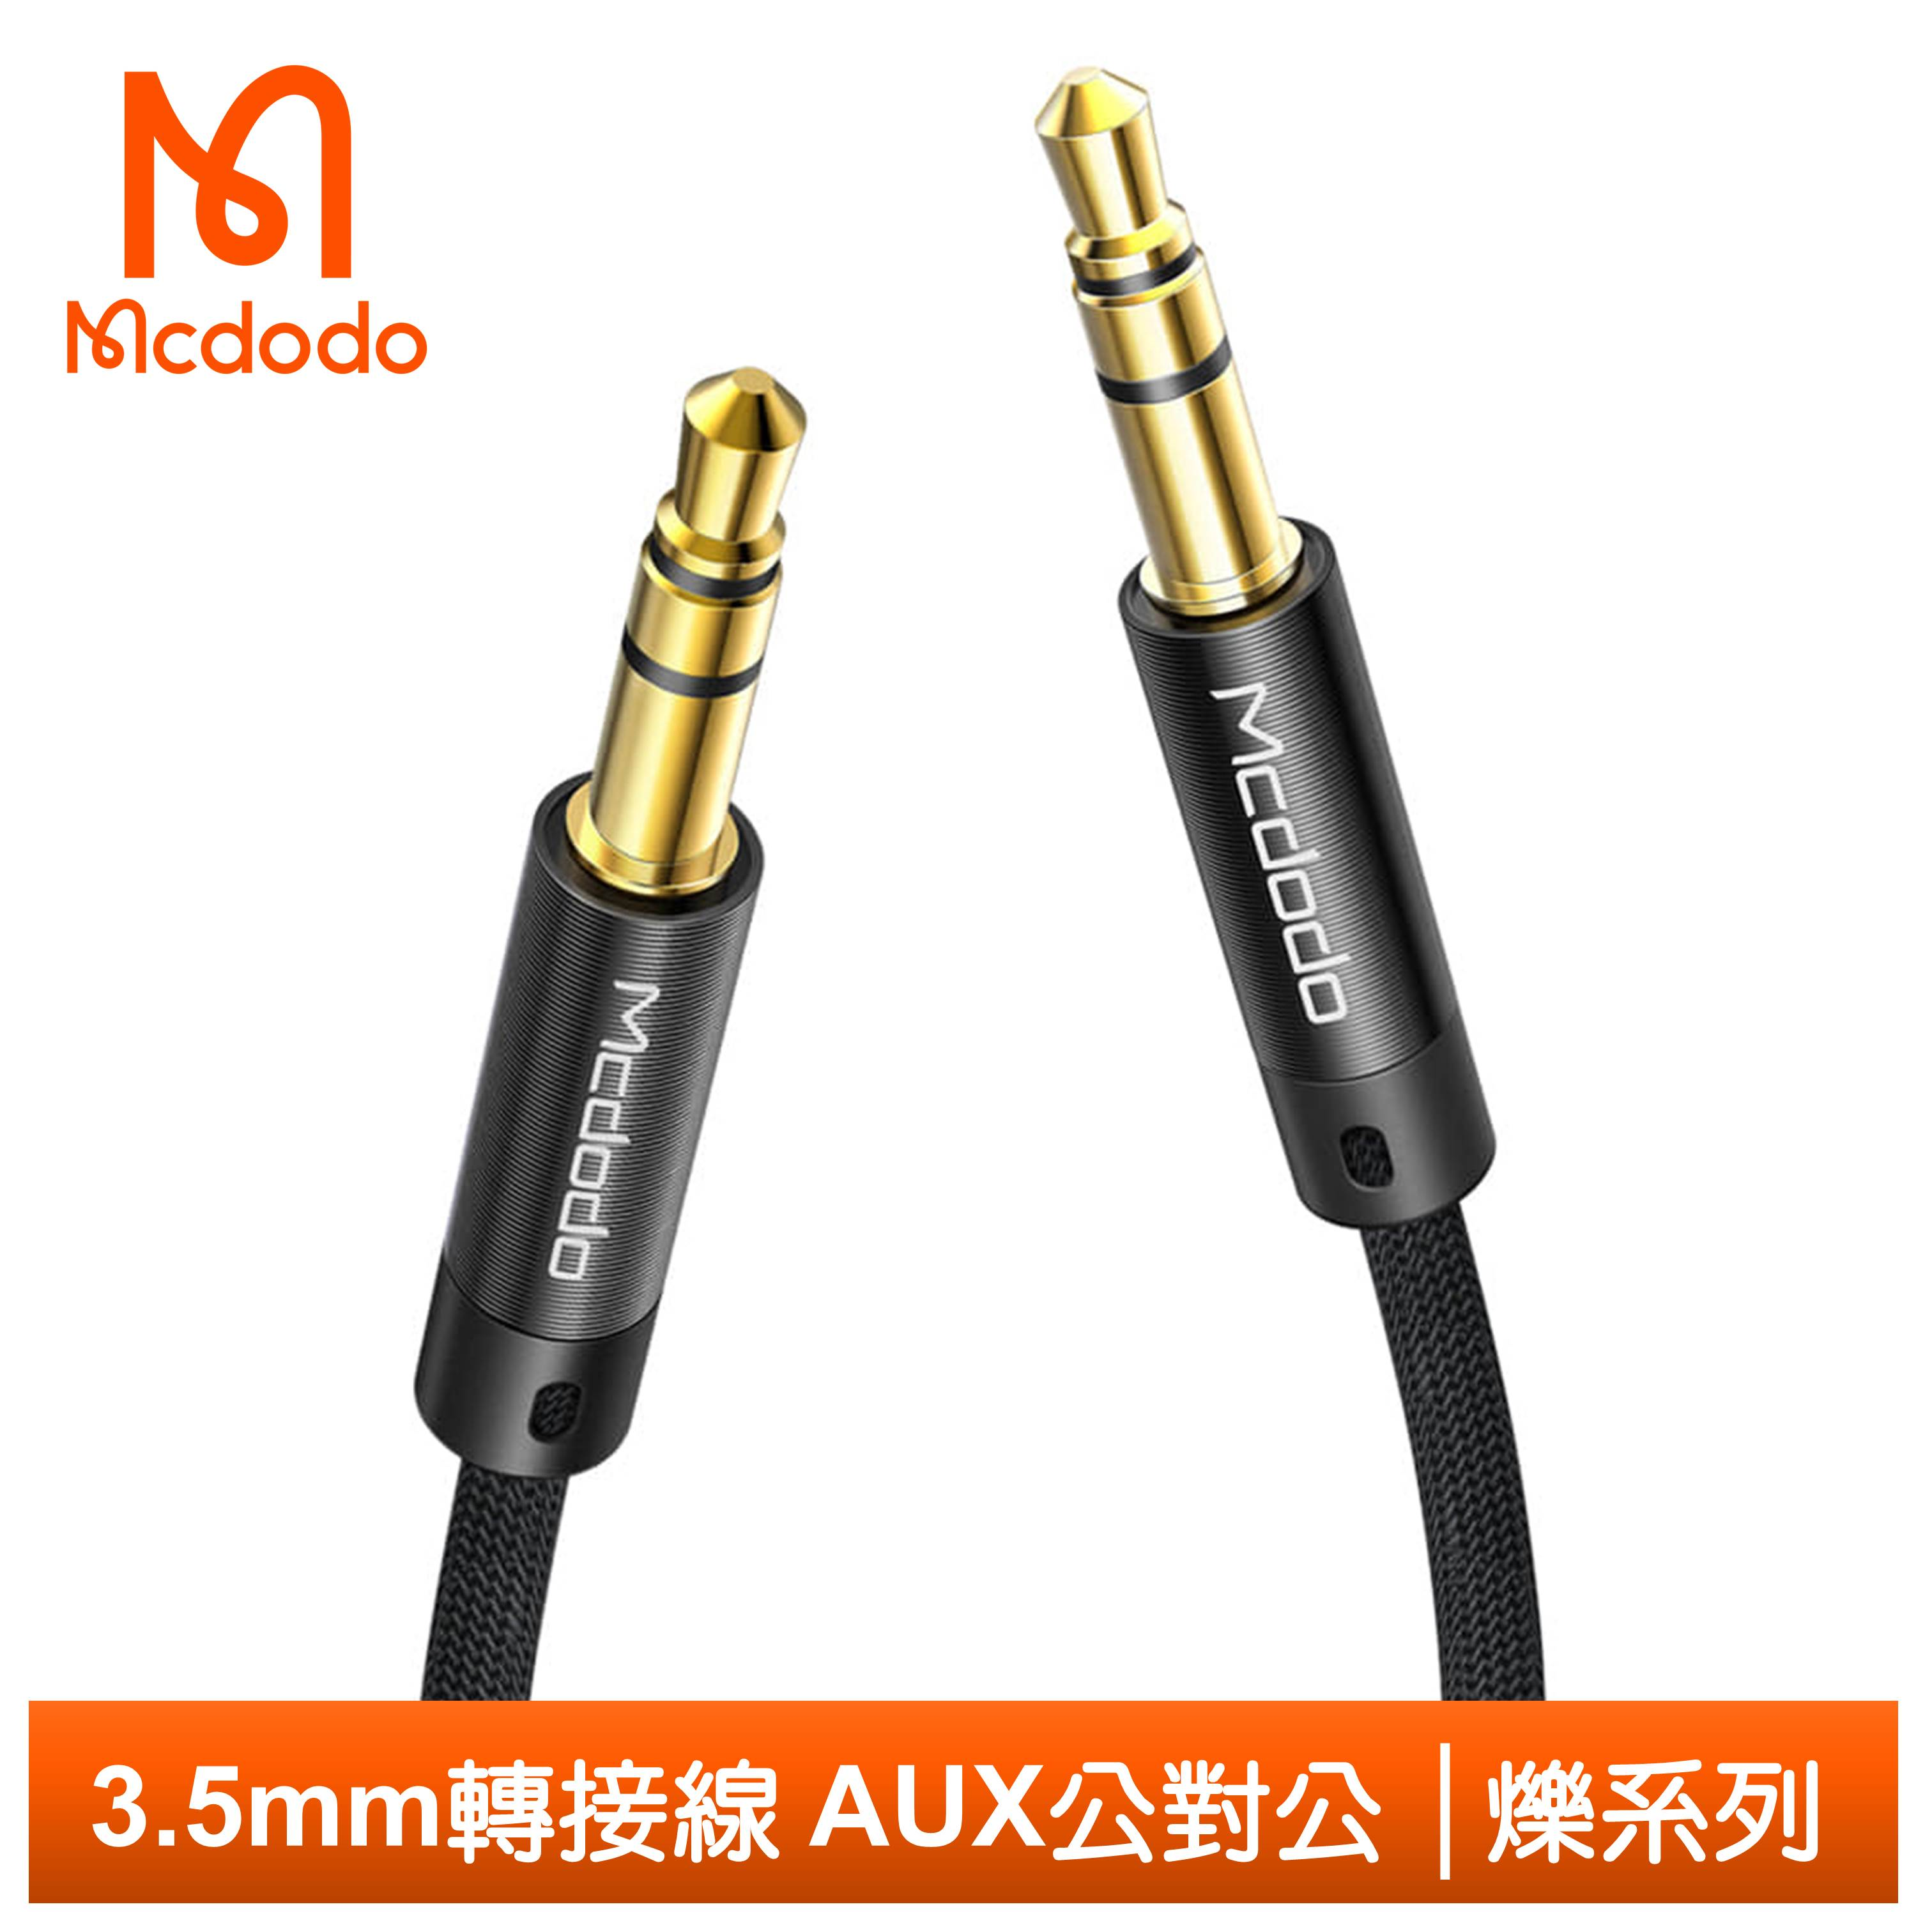 Mcdodo麥多多台灣官方 3.5mm轉接線音頻轉接頭 AUX公對公手機喇叭耳機 爍系列 120cm